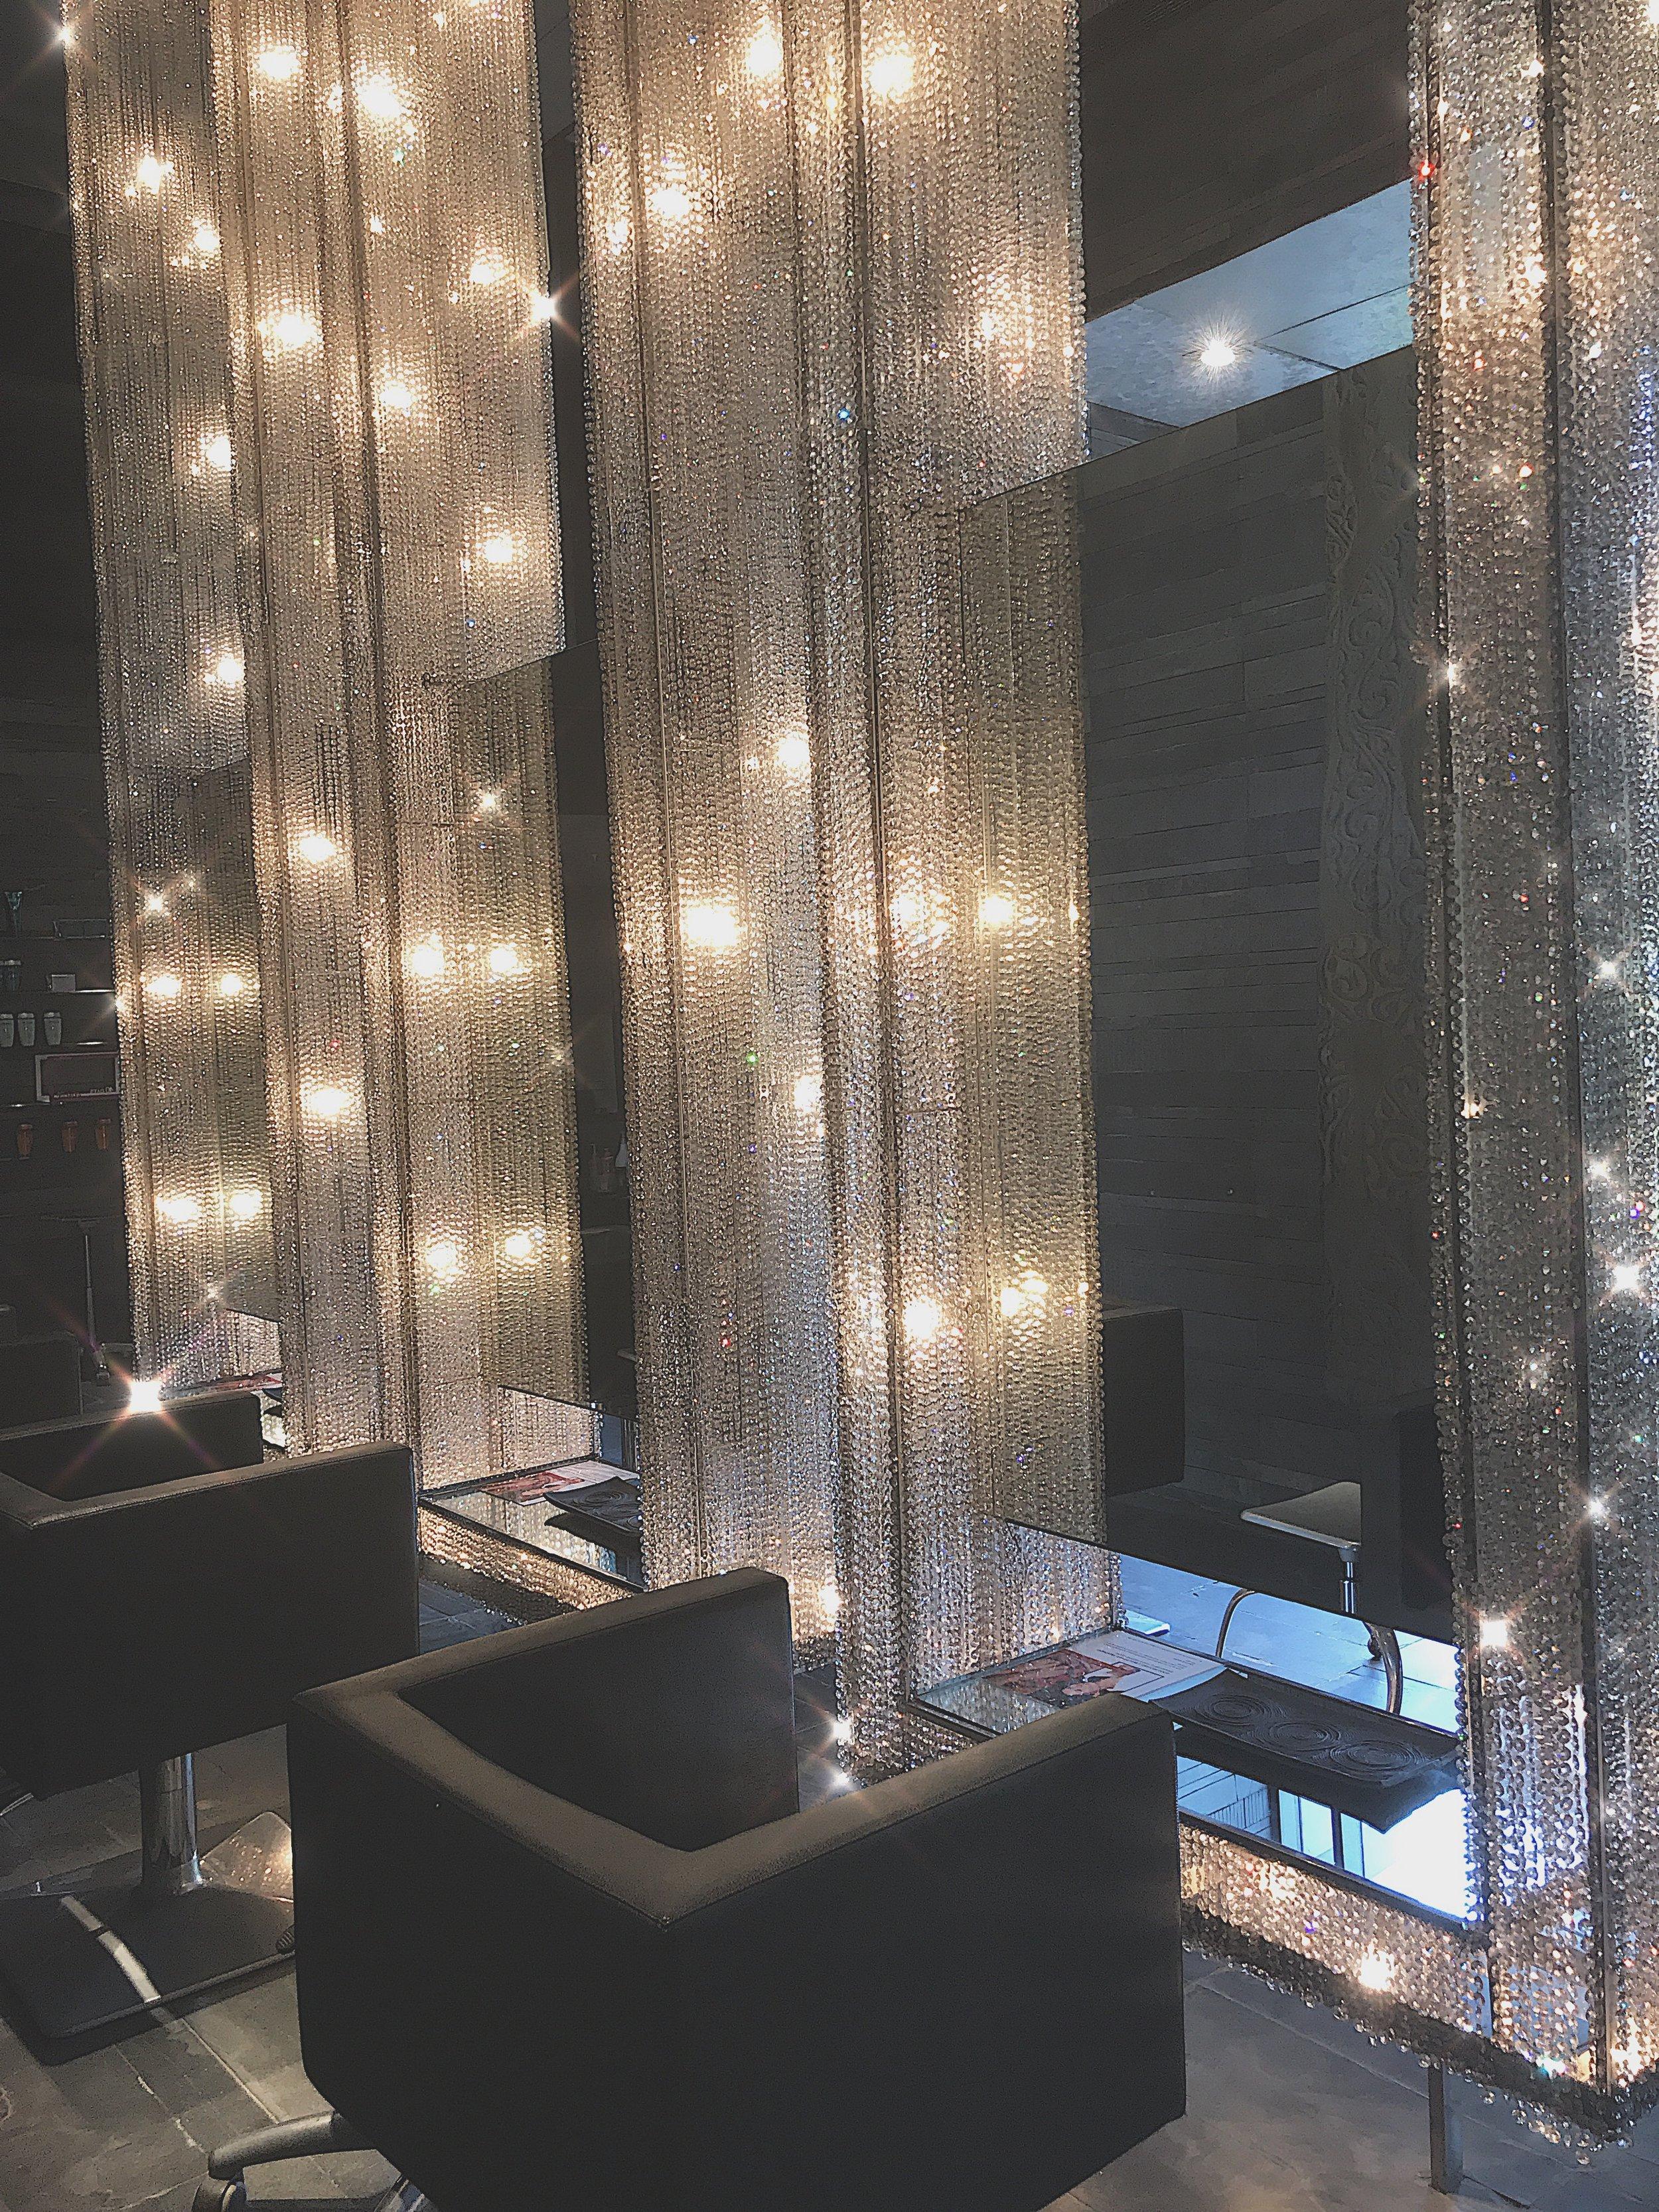 Welcome to Christiaan Georgio Hair and Beauty salon